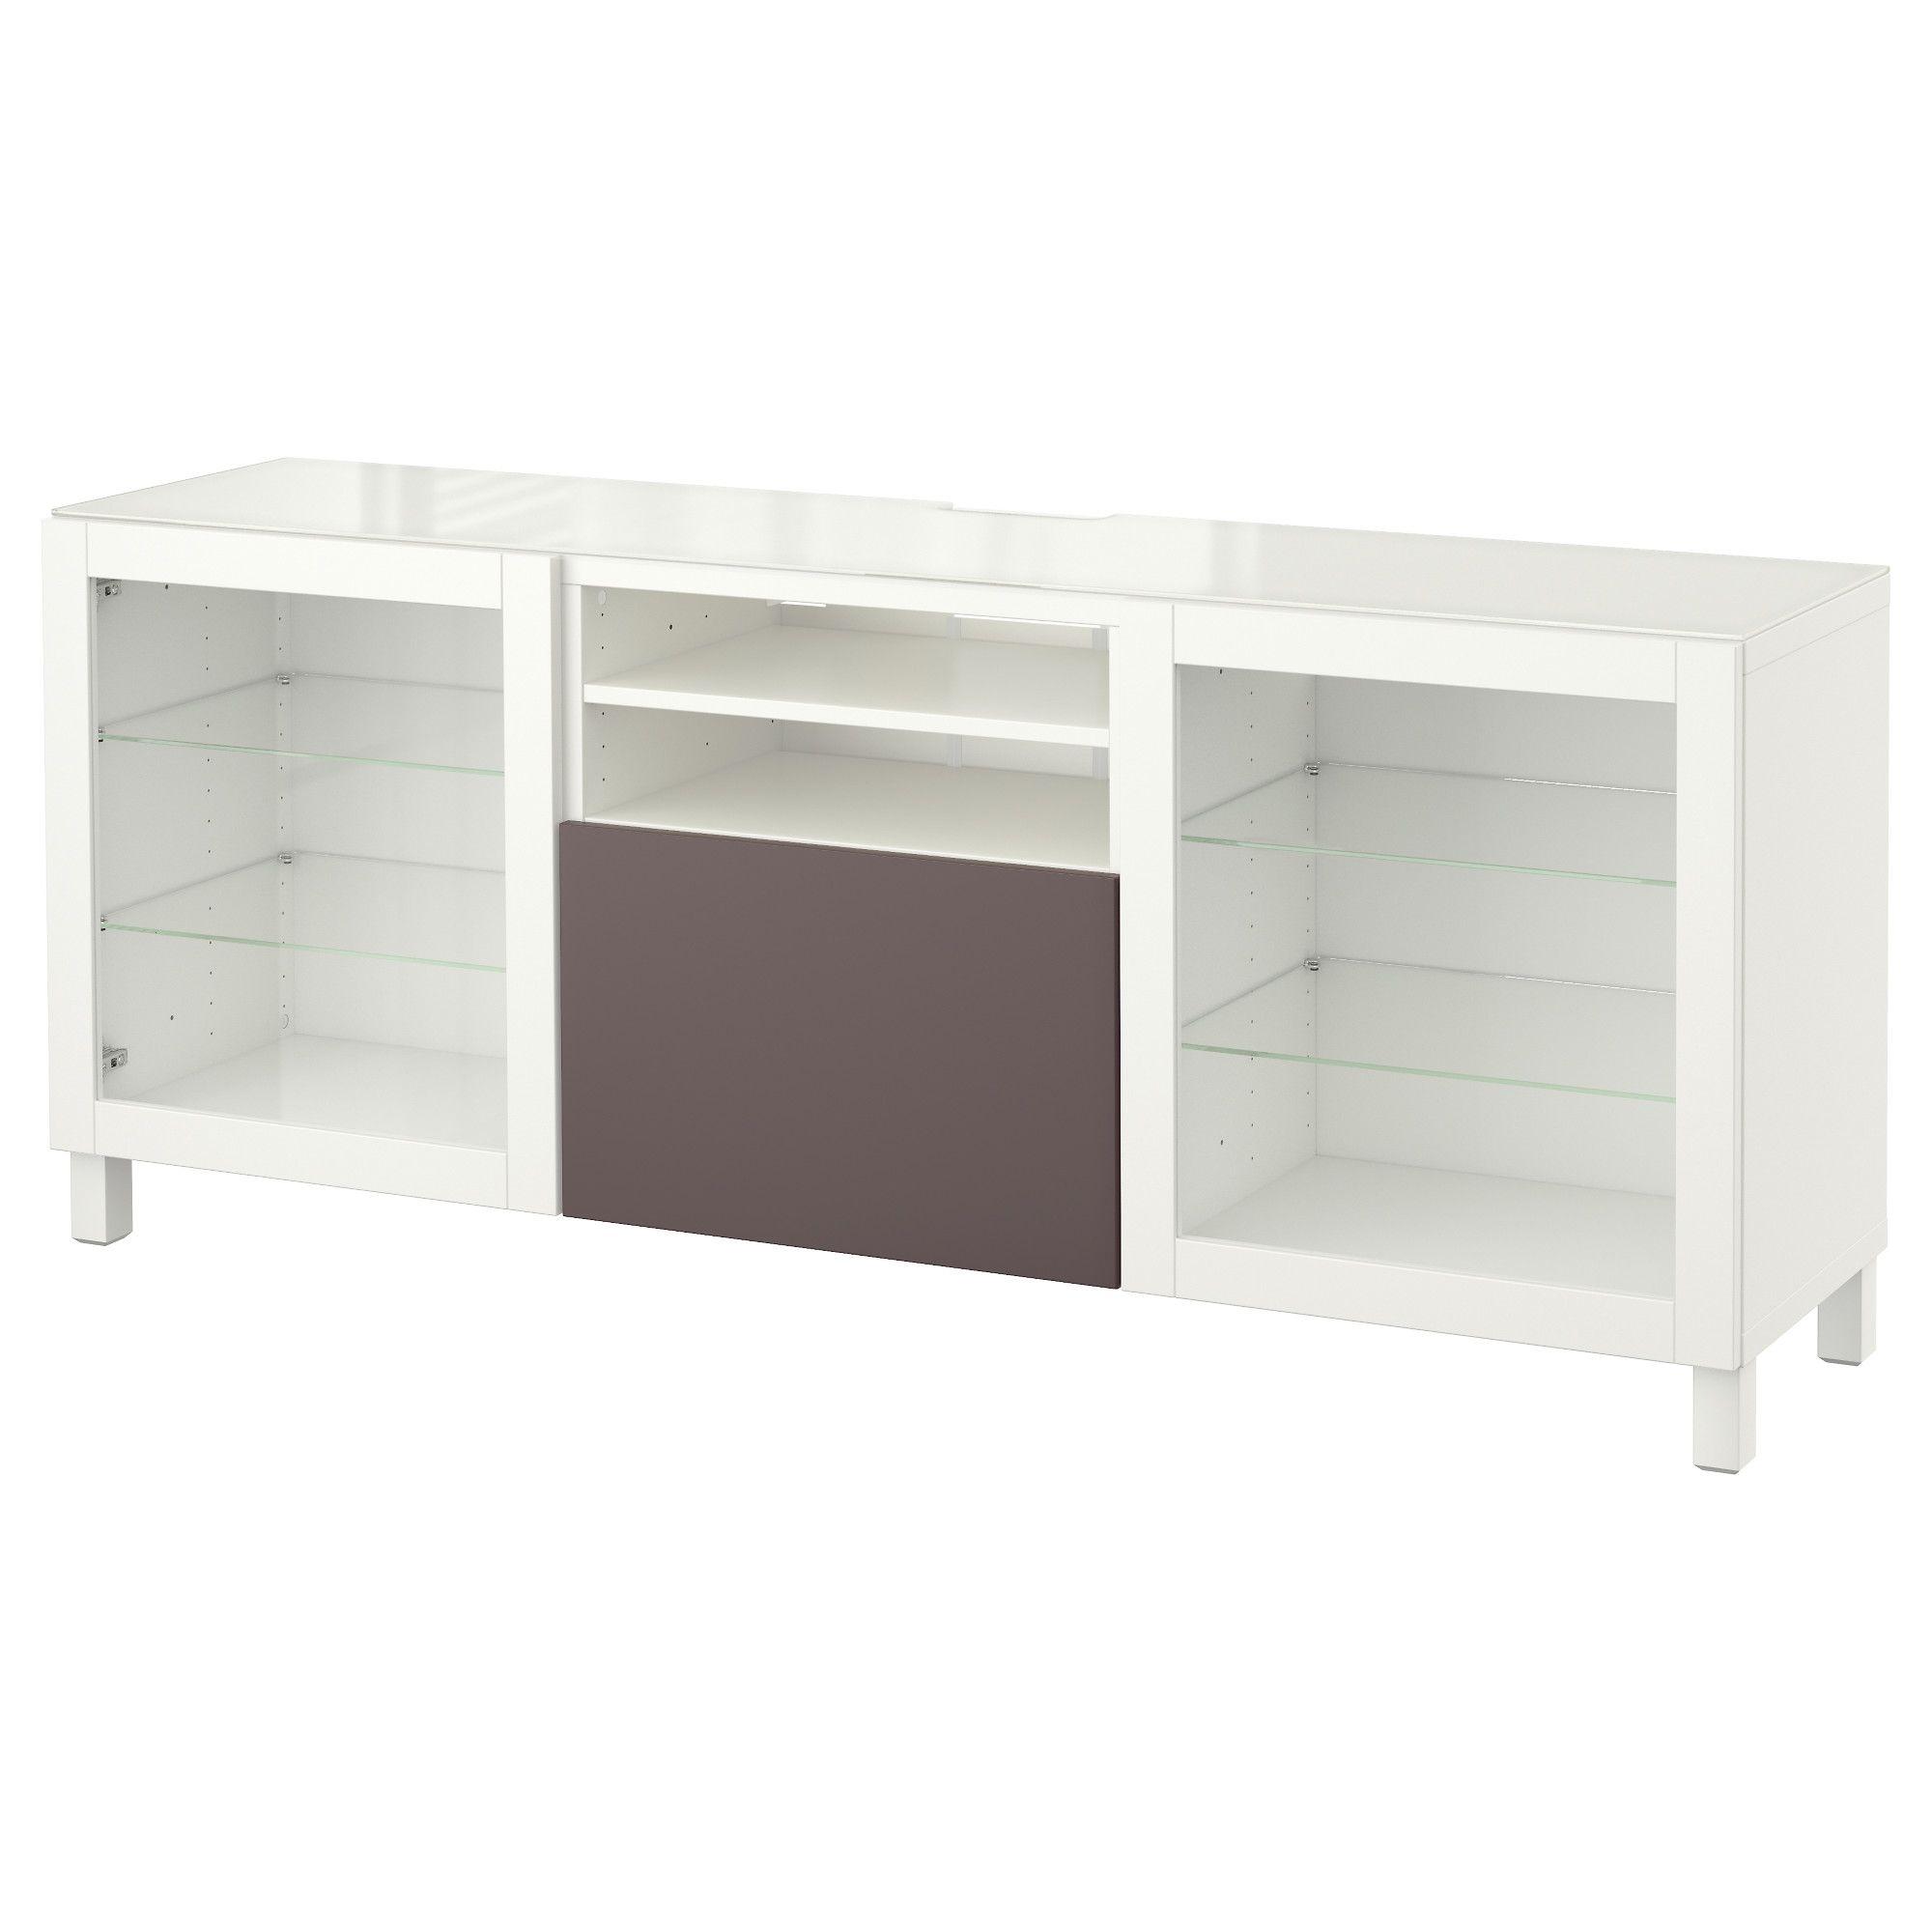 sitzbank wei ikea swalif. Black Bedroom Furniture Sets. Home Design Ideas